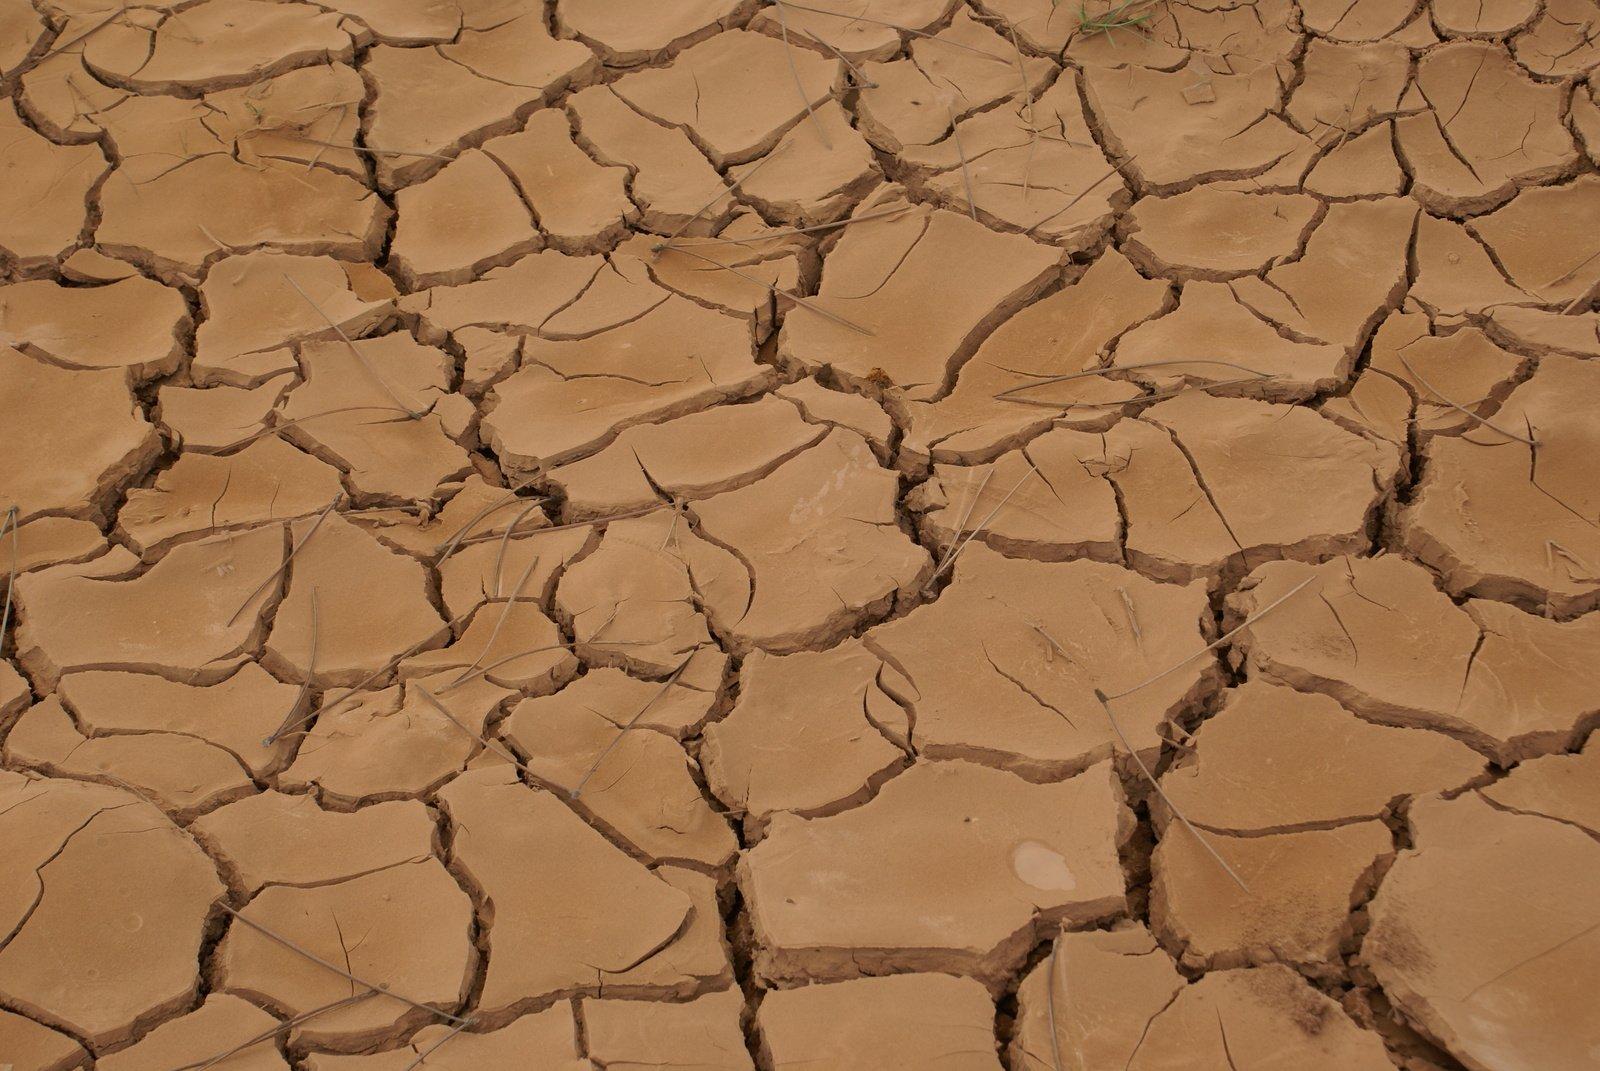 drought global warming